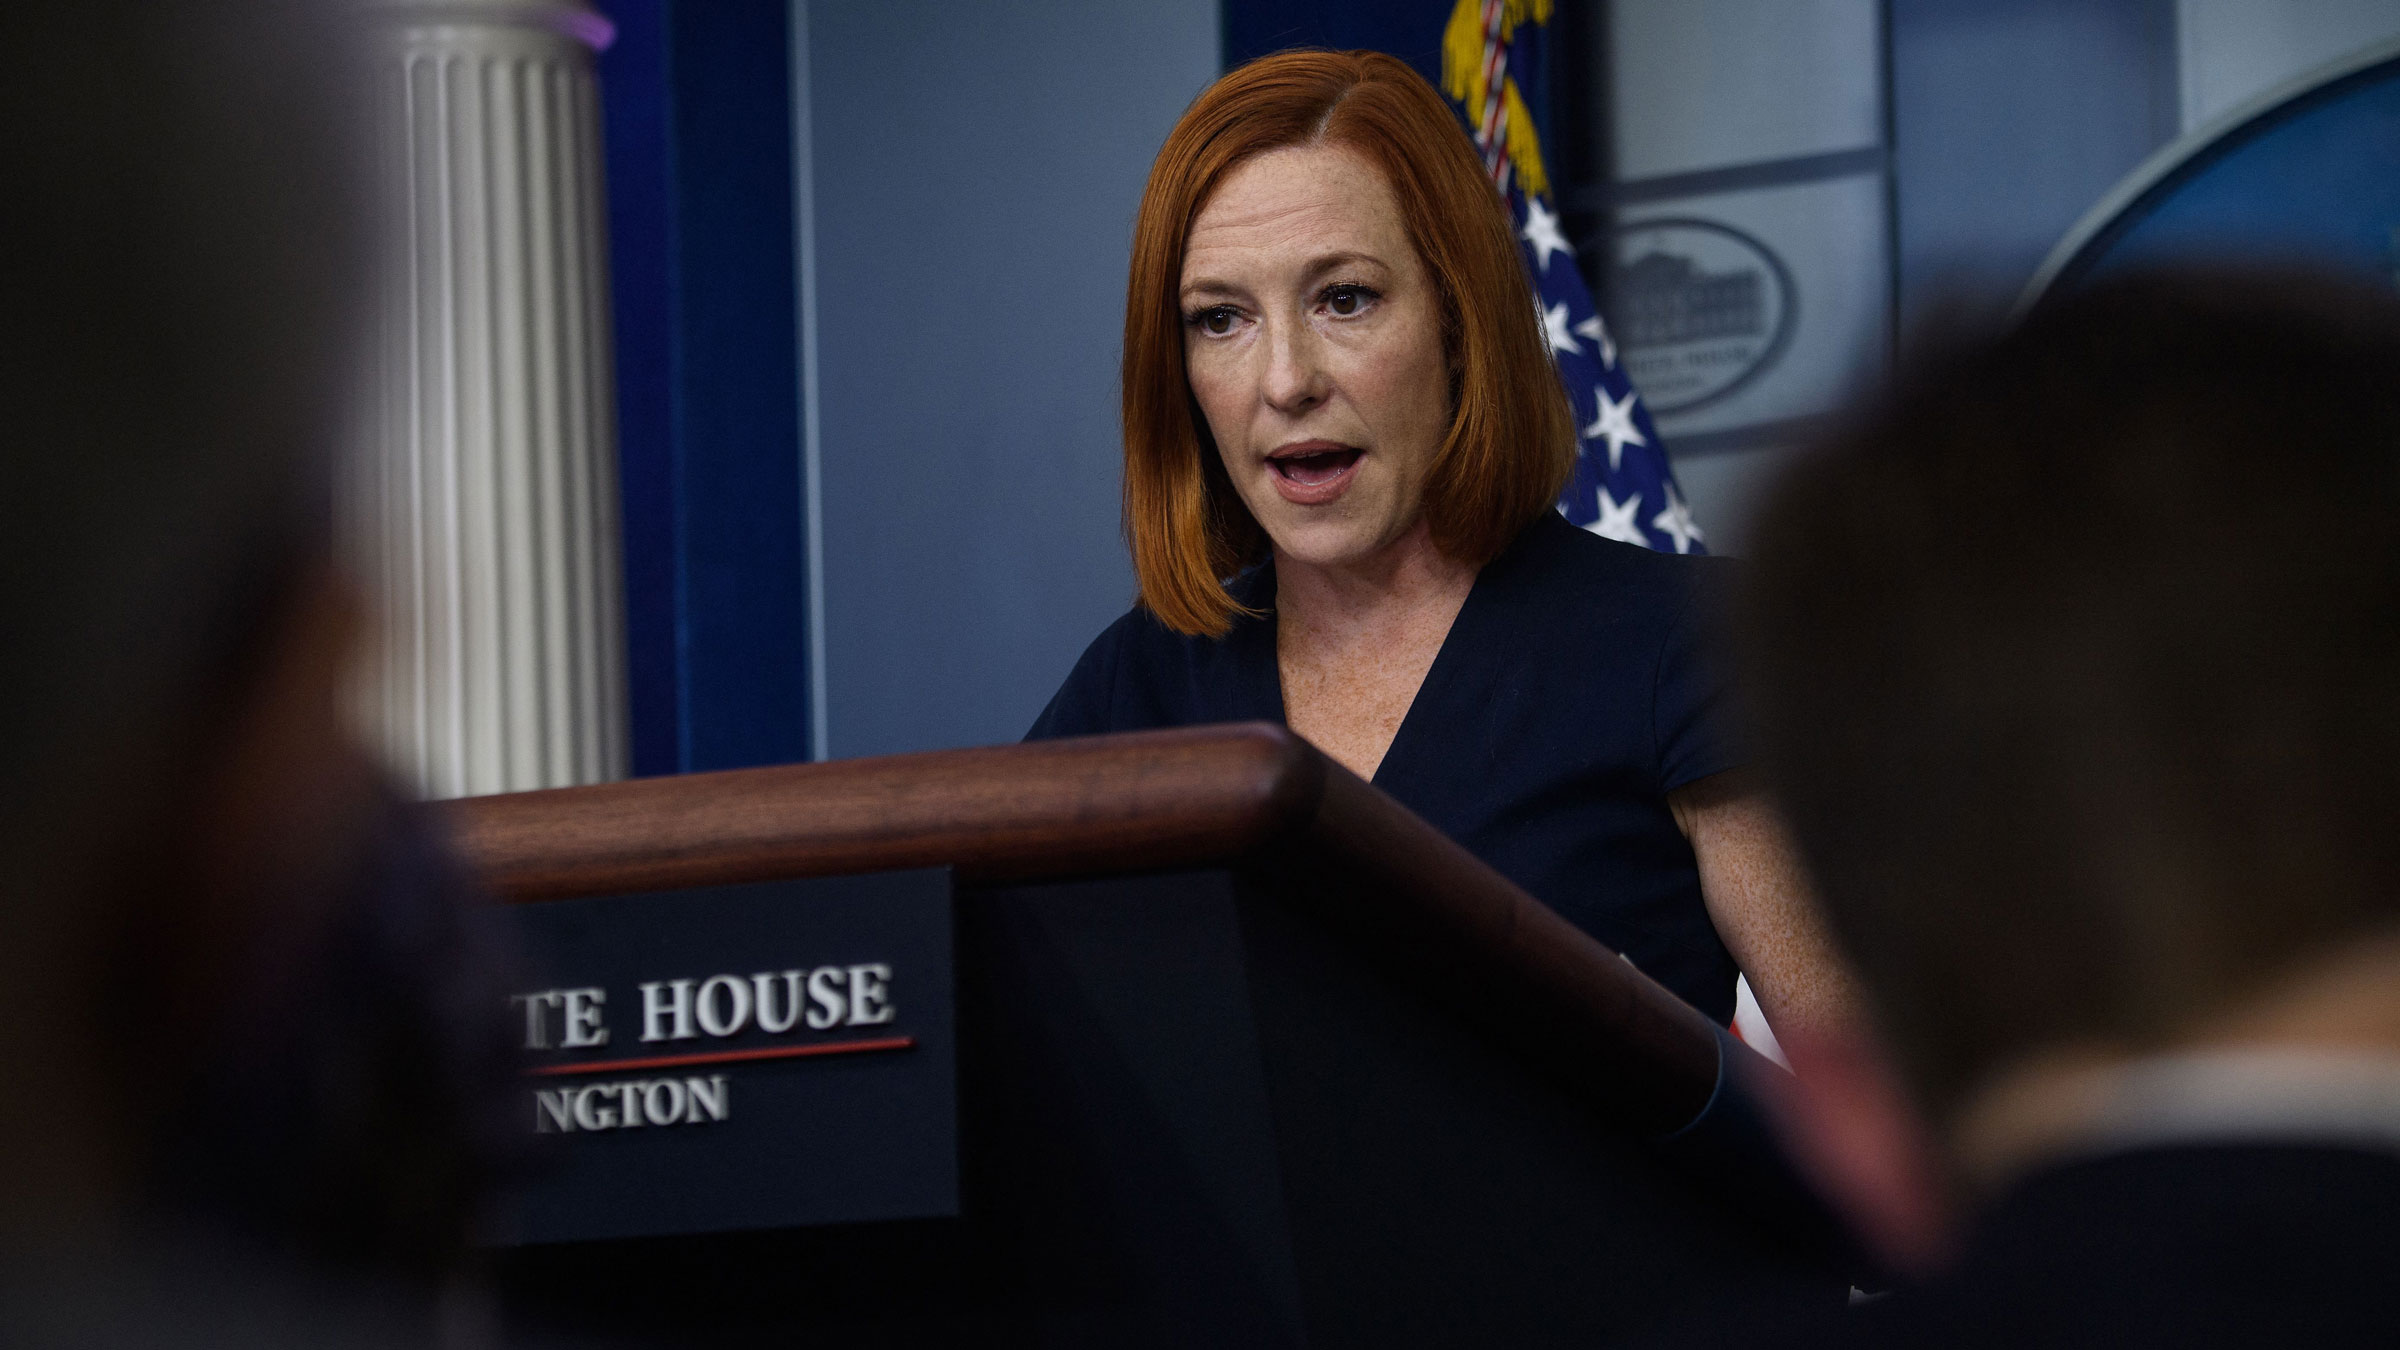 White House press secretary Jen Psaki speaks to the media on Wednesday.